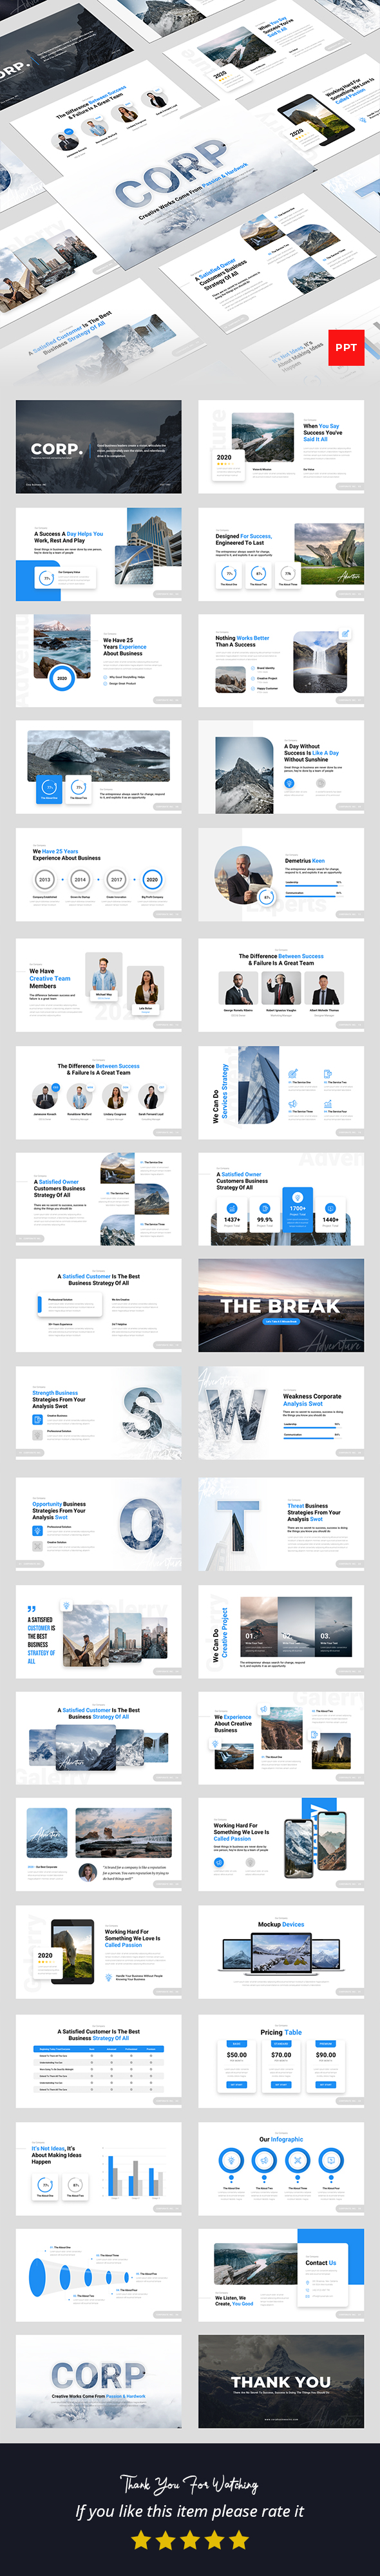 Corp - Creative Business PowerPoint Presentation Template